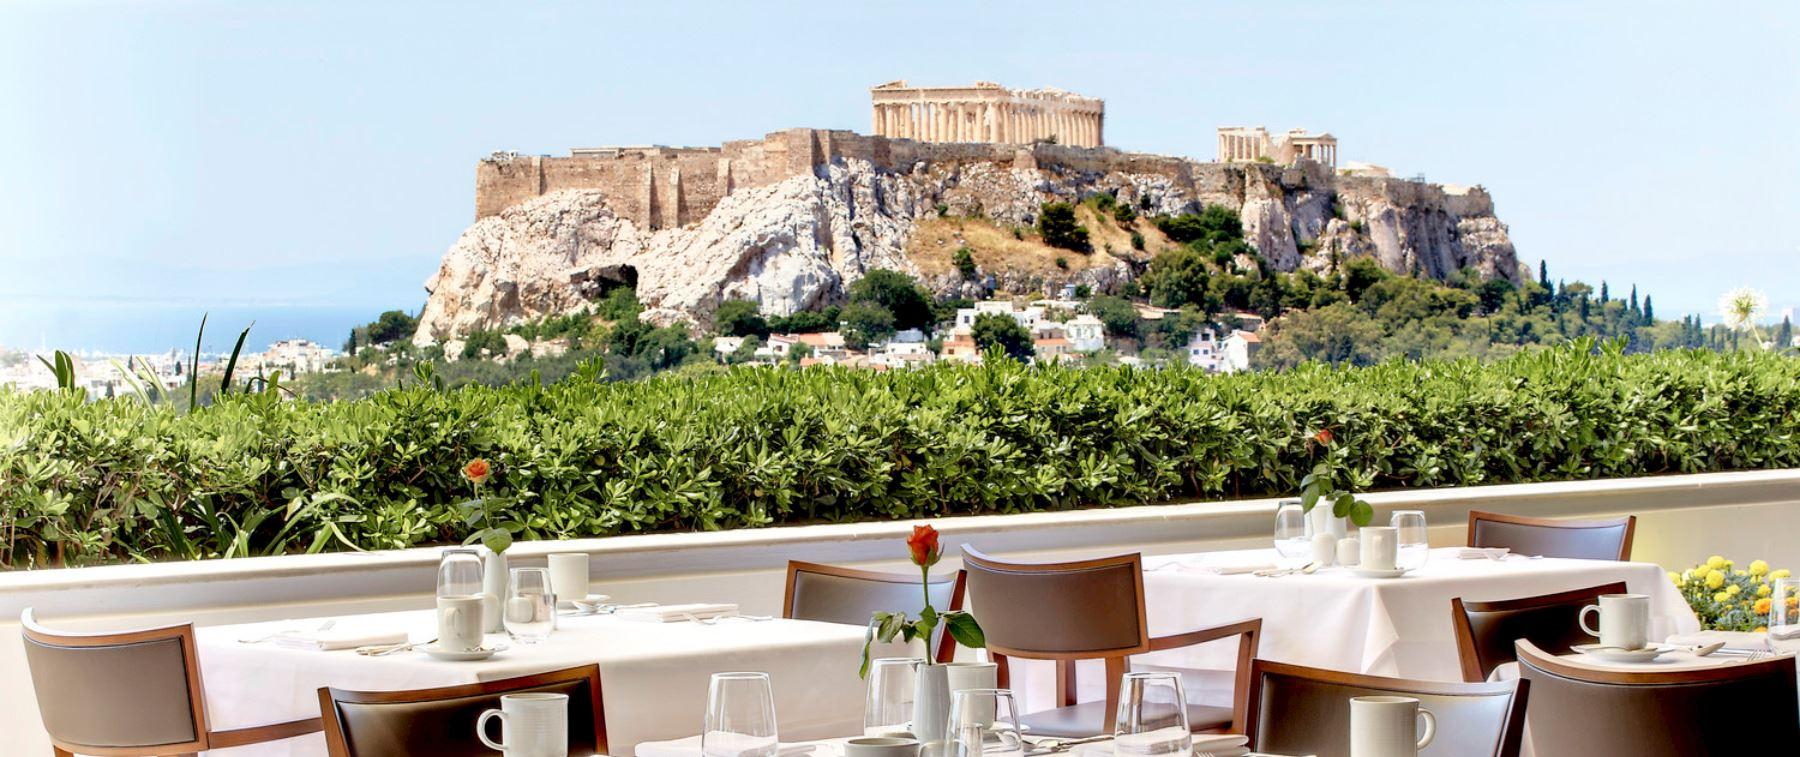 GB Roof Garden Restaurant & Bar, Athens